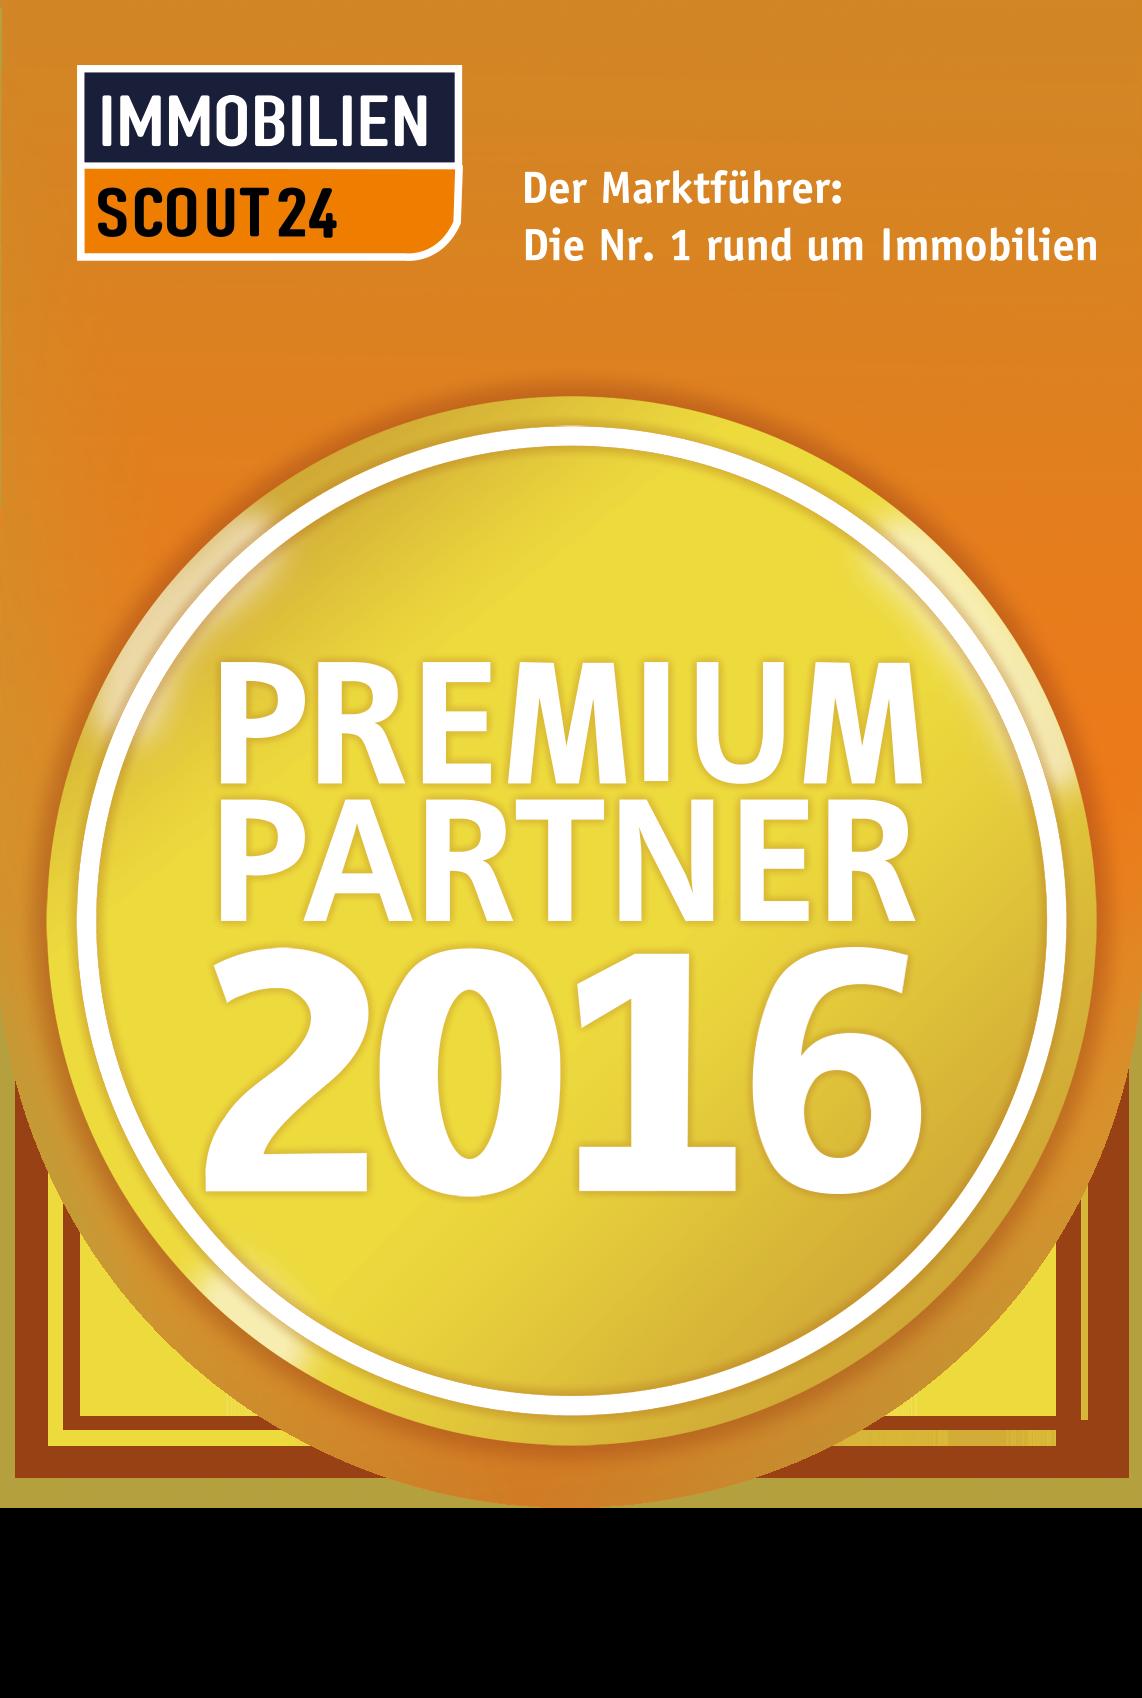 ImmobilienScout24 Premium Partner 2016